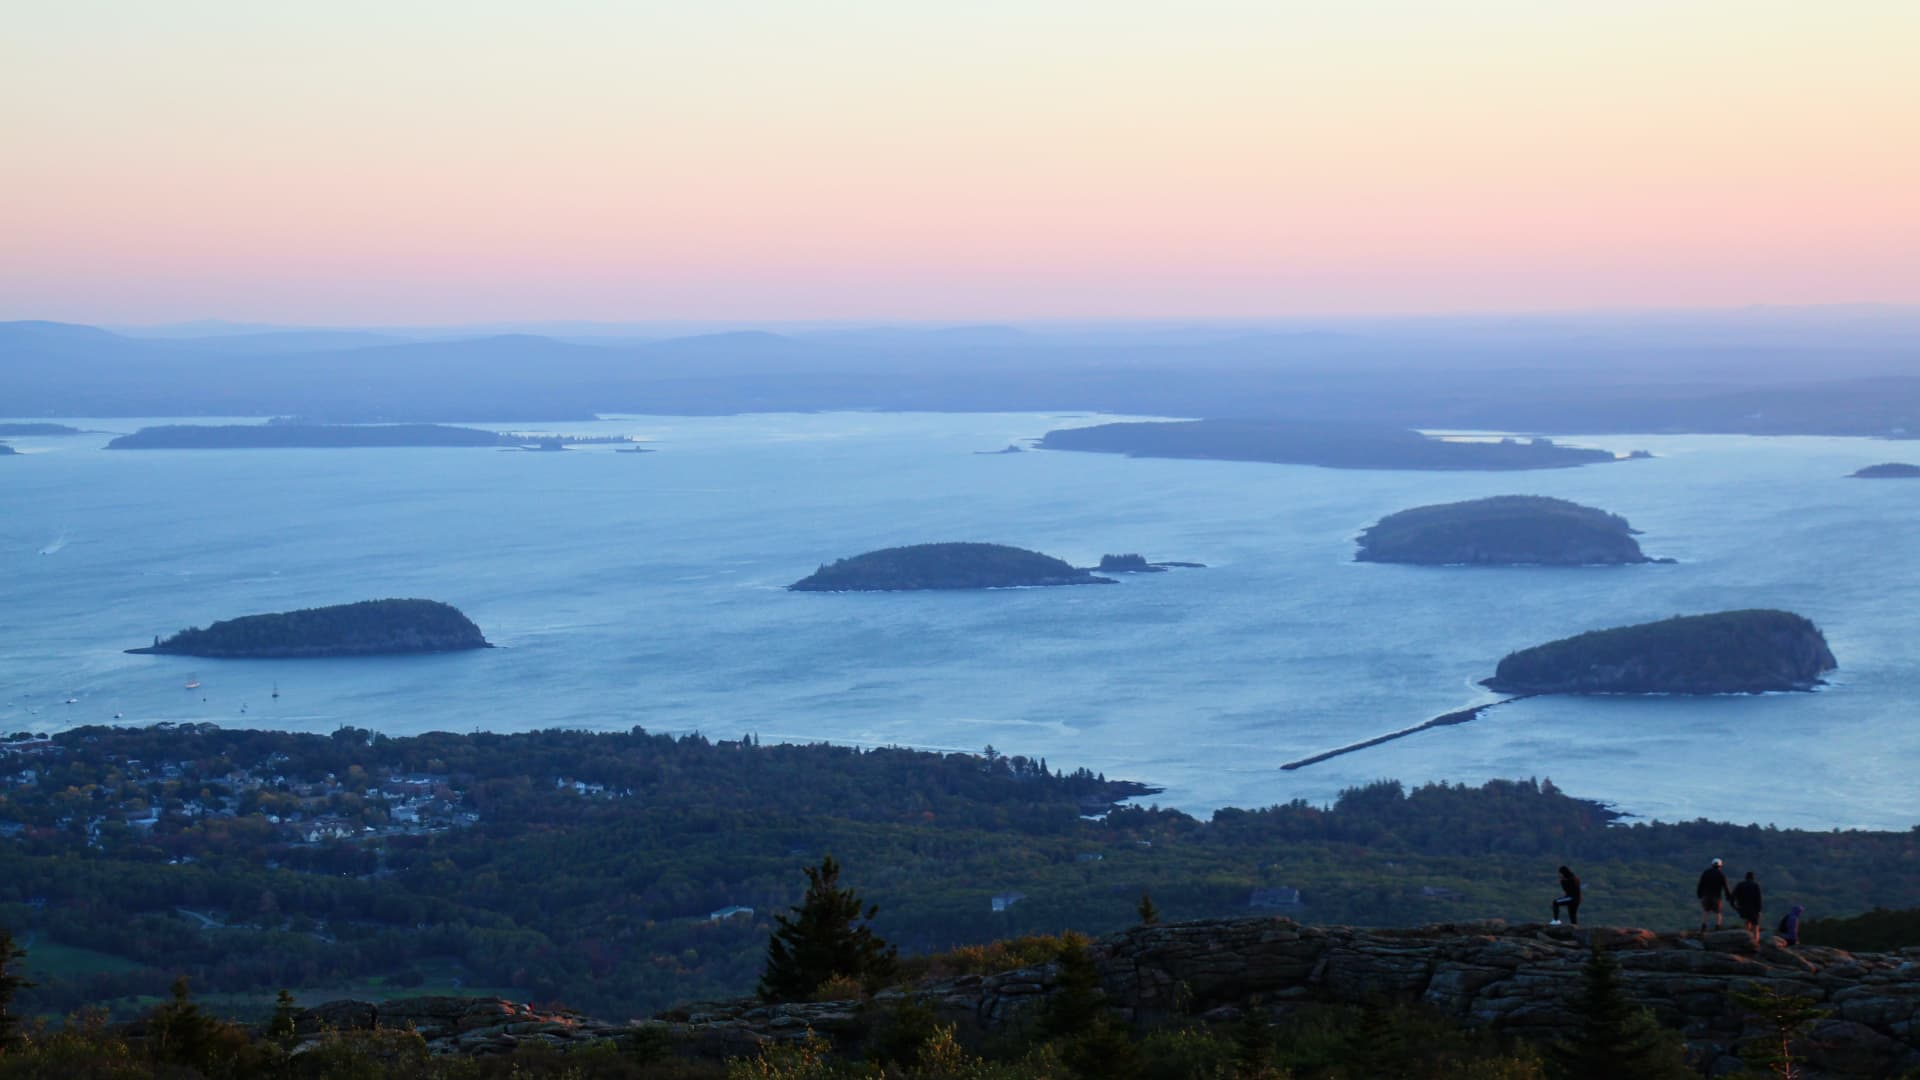 Sunrise at Cadillac Mountain in Acadia National Park, Maine.